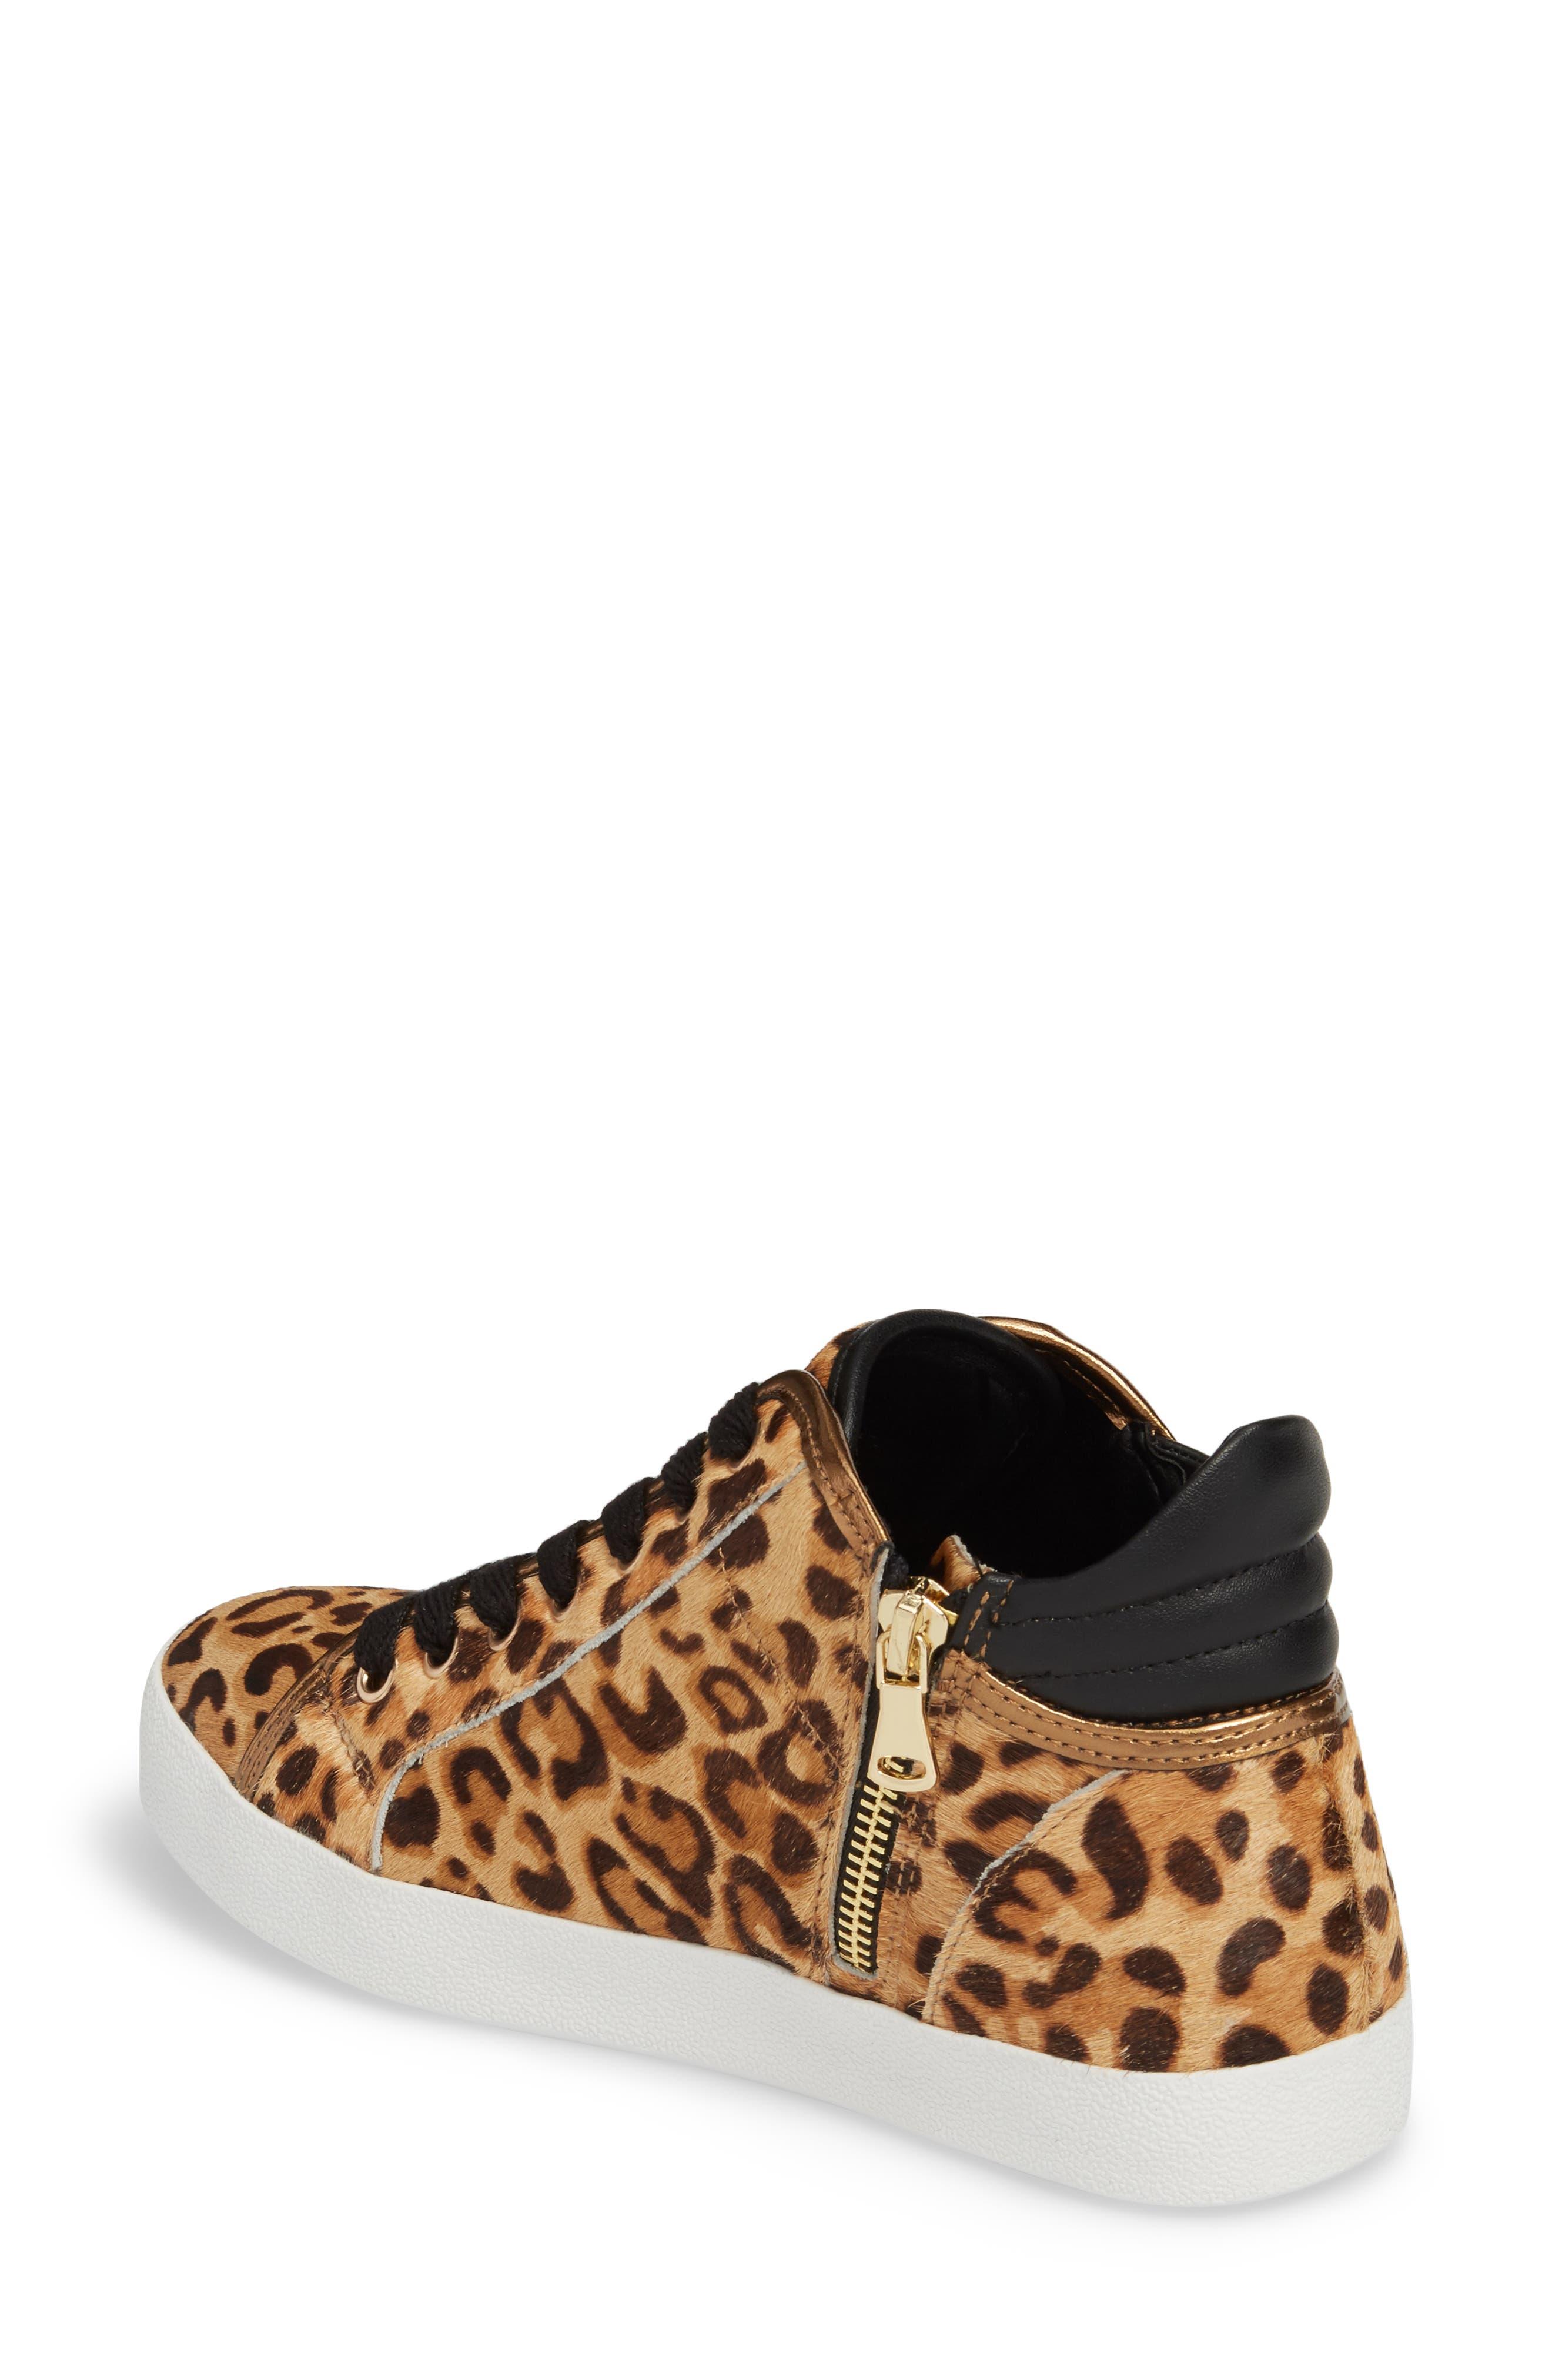 Savior Star Sneaker,                             Alternate thumbnail 2, color,                             Leopard Multi